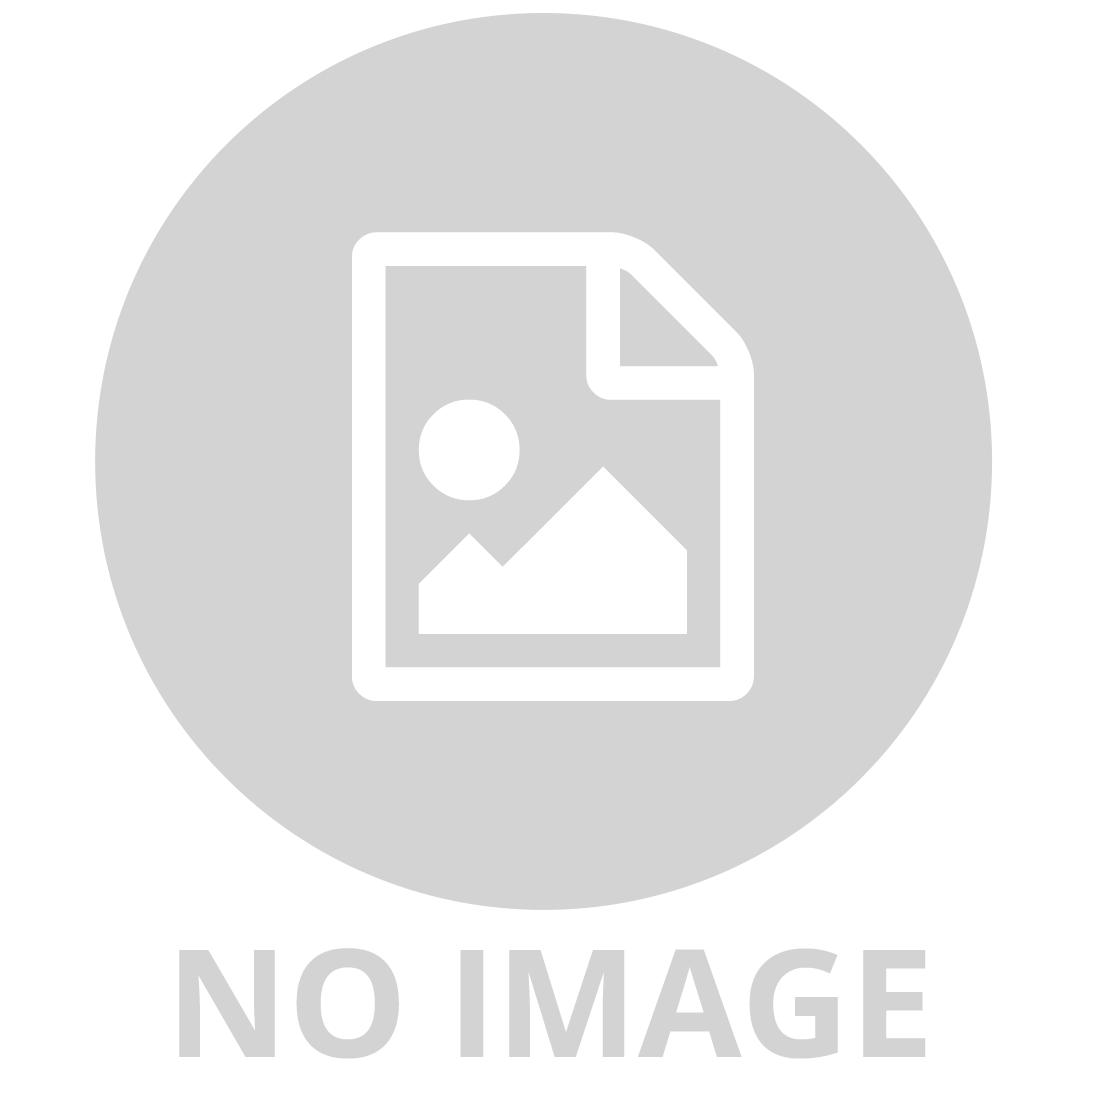 RAVENSBURGER 1000PCE PUZZLE SYDNEY OPERA HOUSE AND HARBOUR BRIDGE